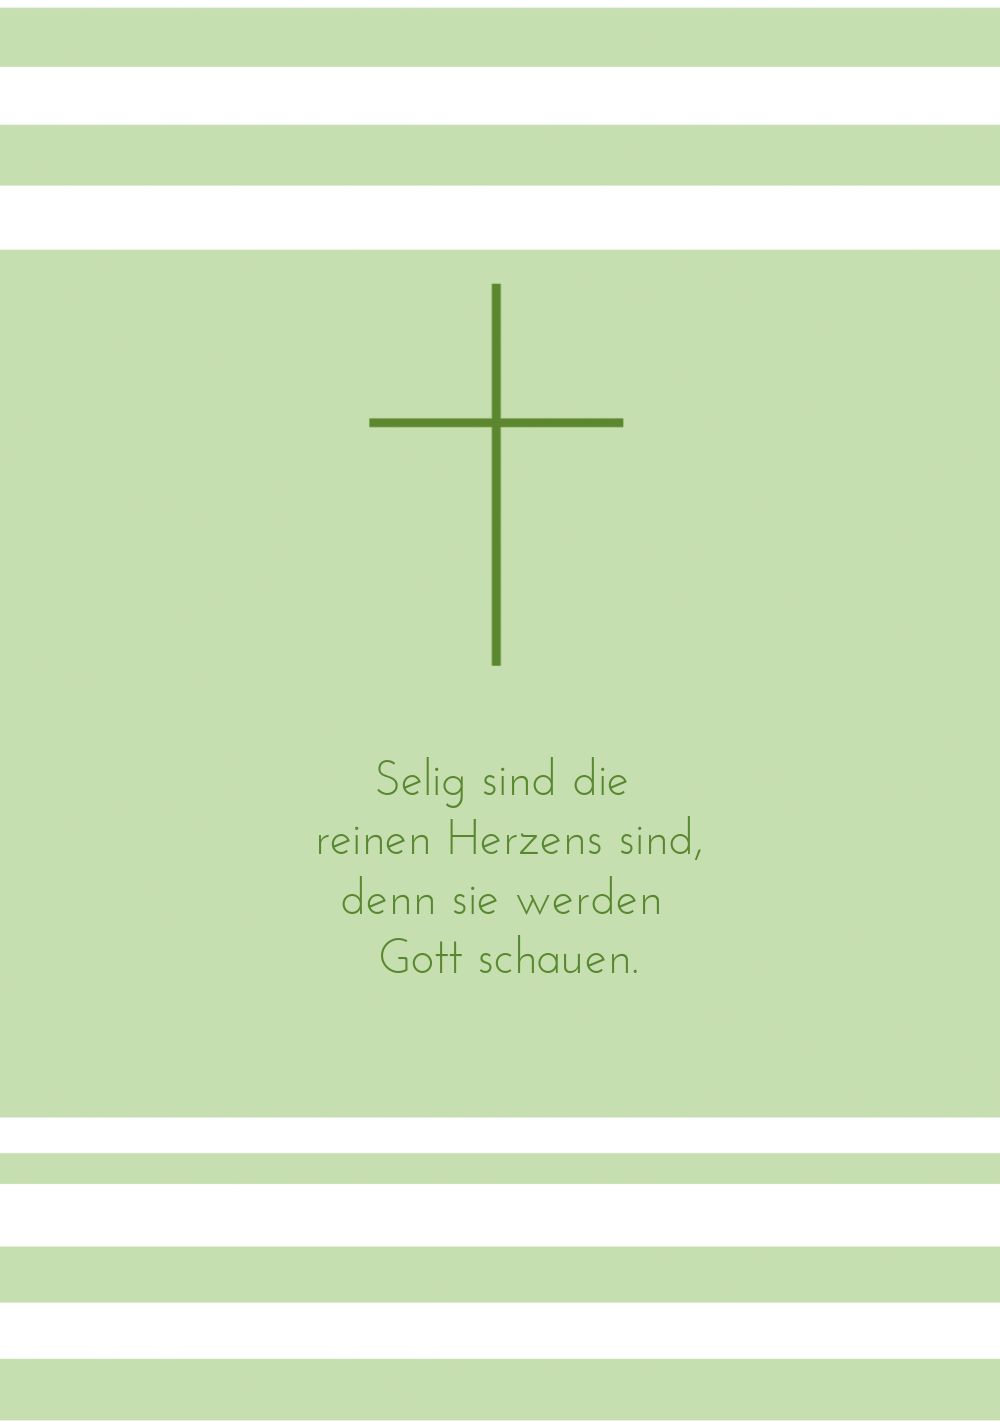 Ansicht 4 - Konfirmation Dankeskarte Kreuz